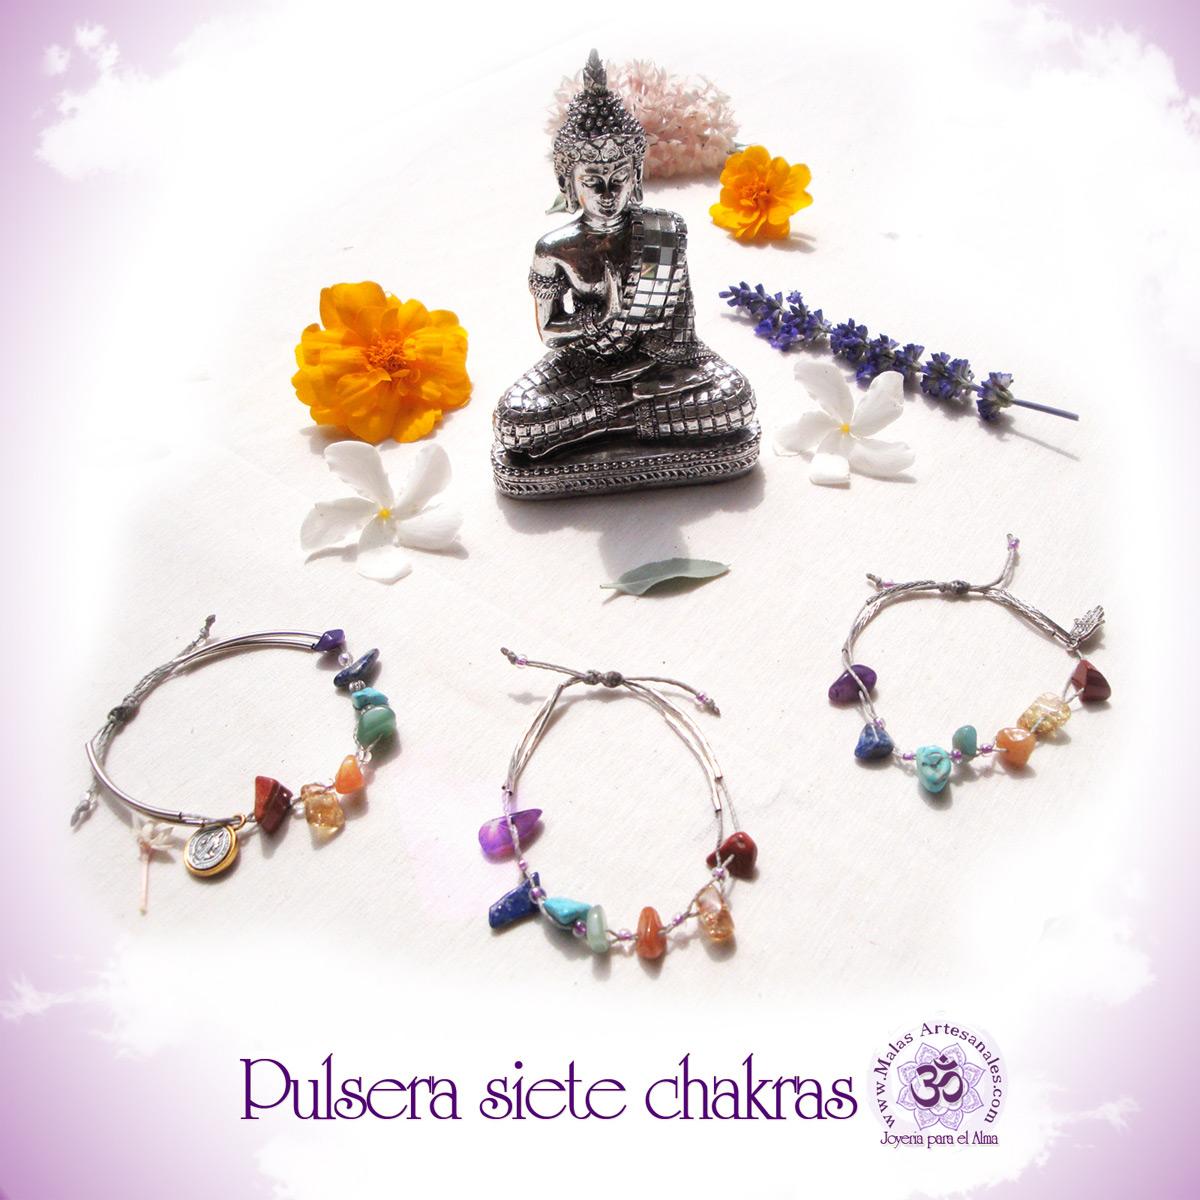 pulsera_espiritual_artesanal_malas_siete_chakras_meditacion_buda